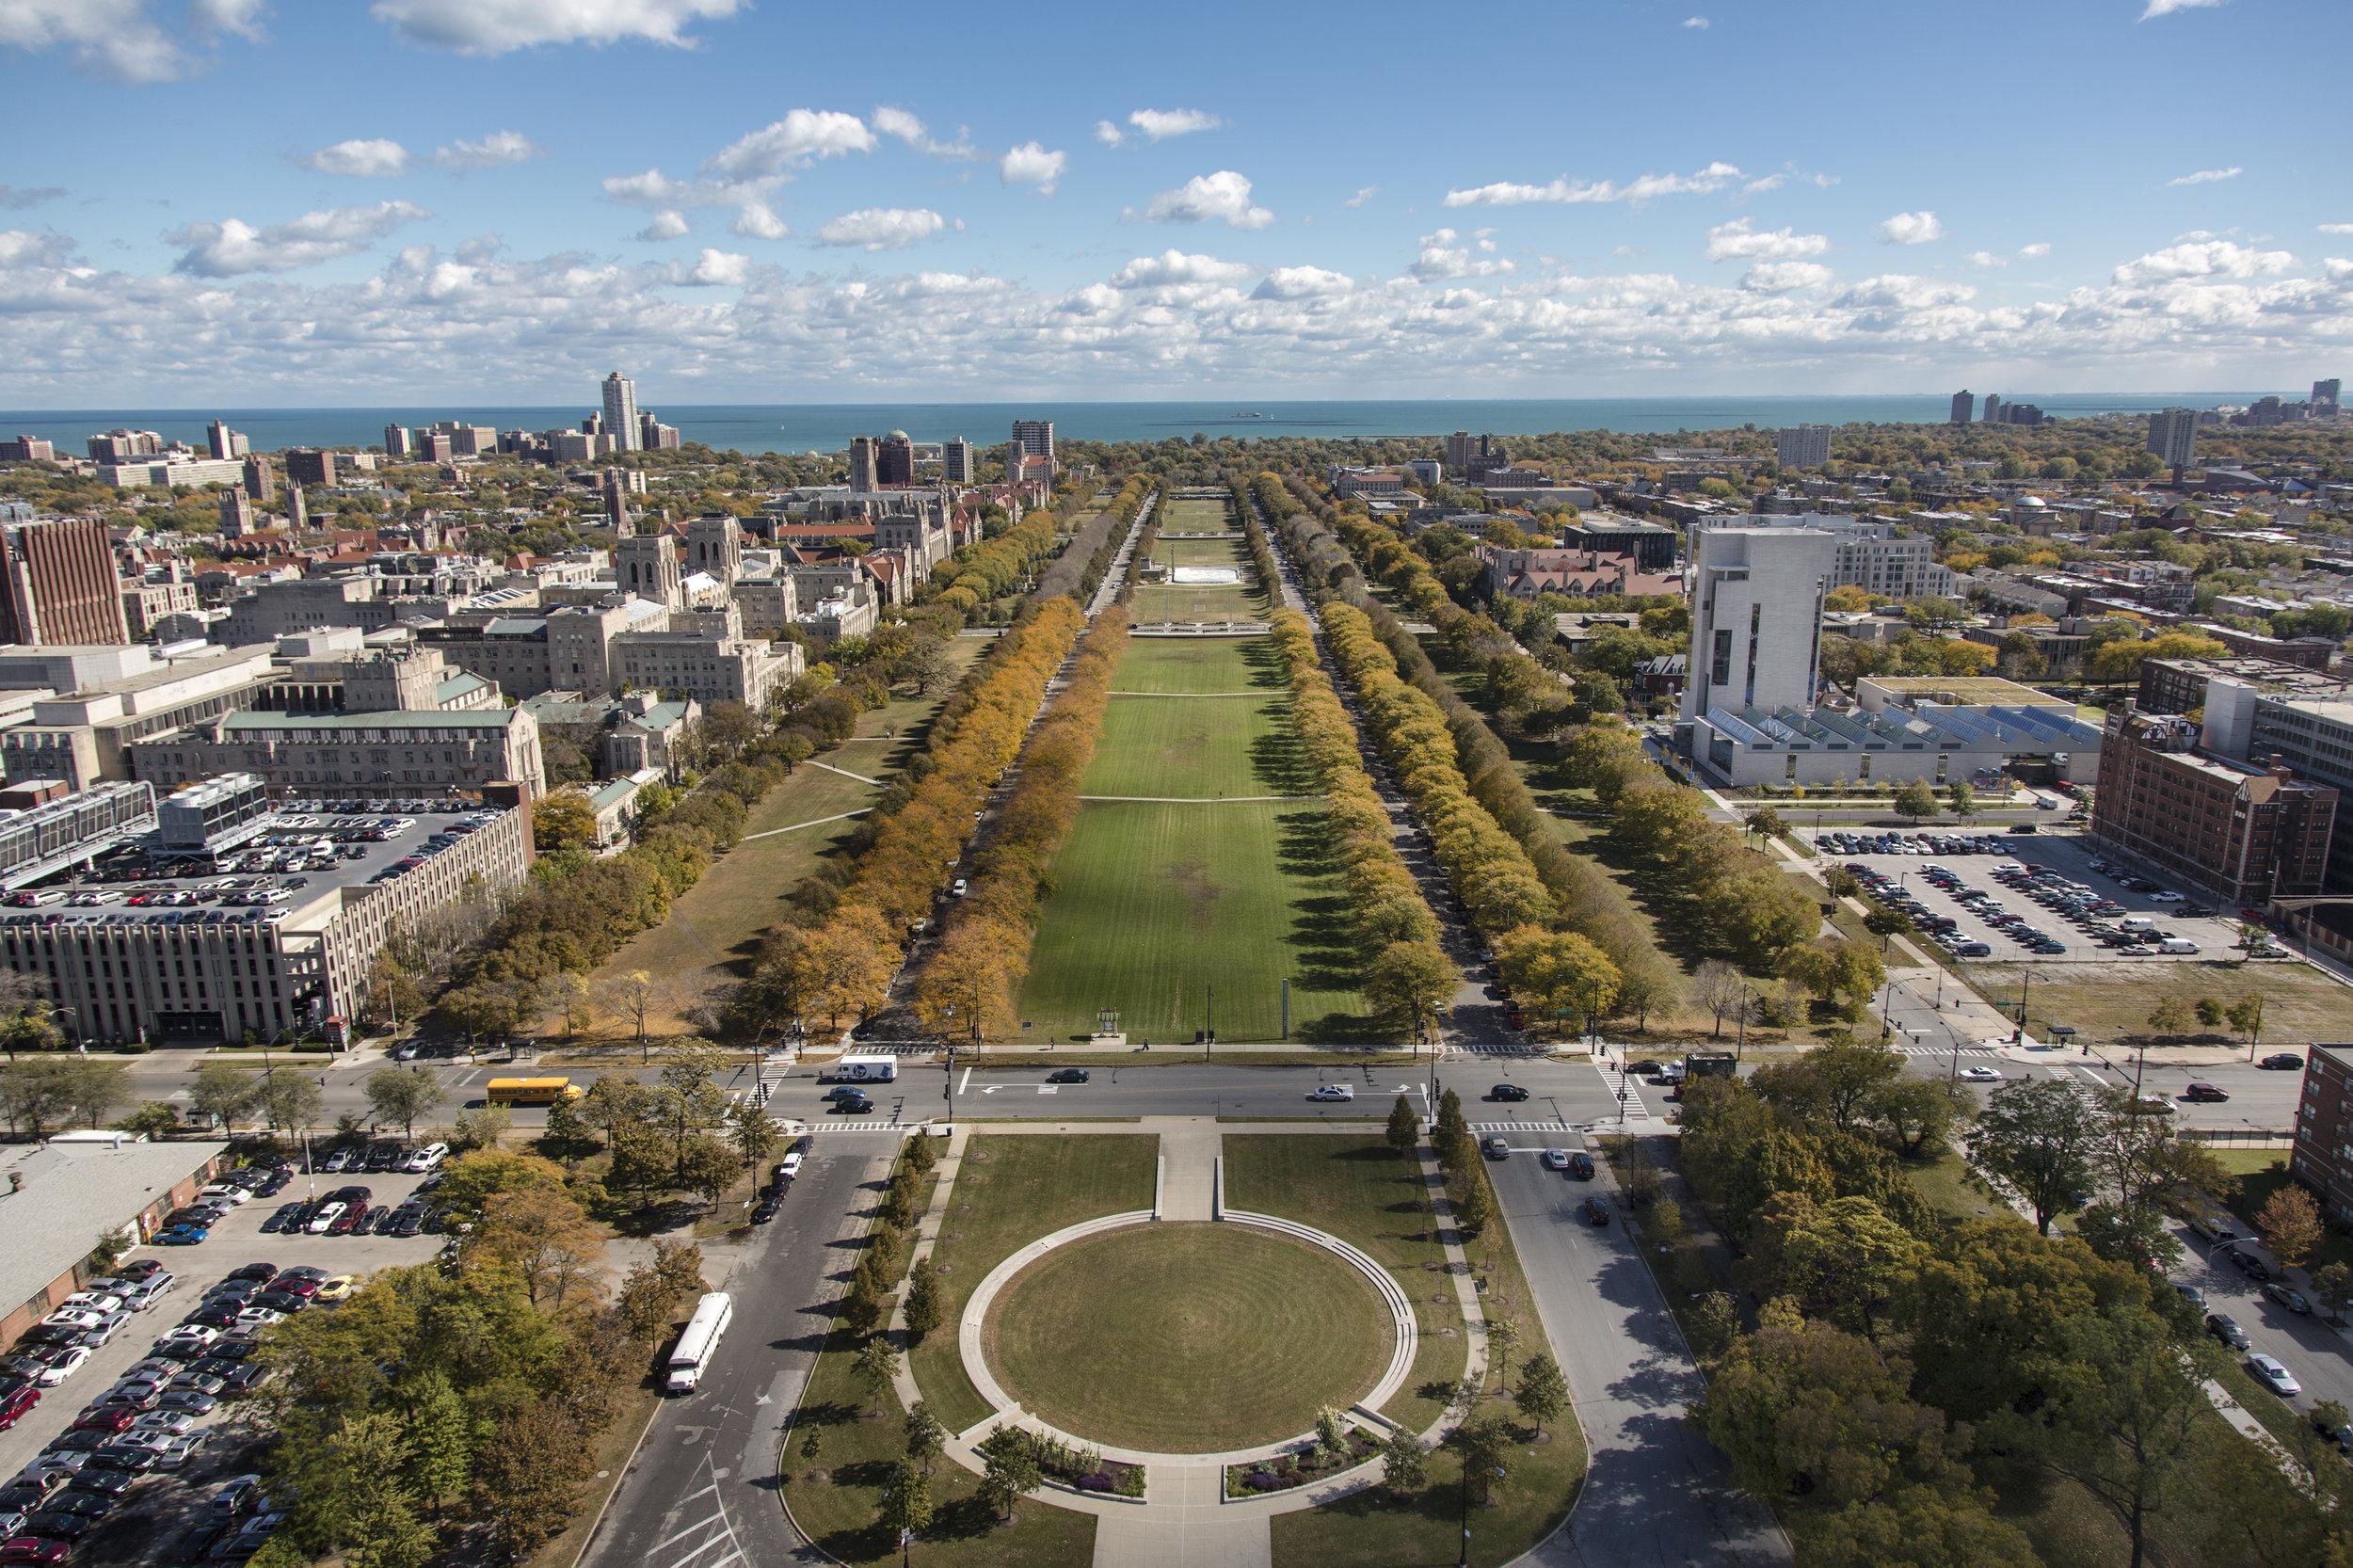 University of Illinois Urbana Champaign